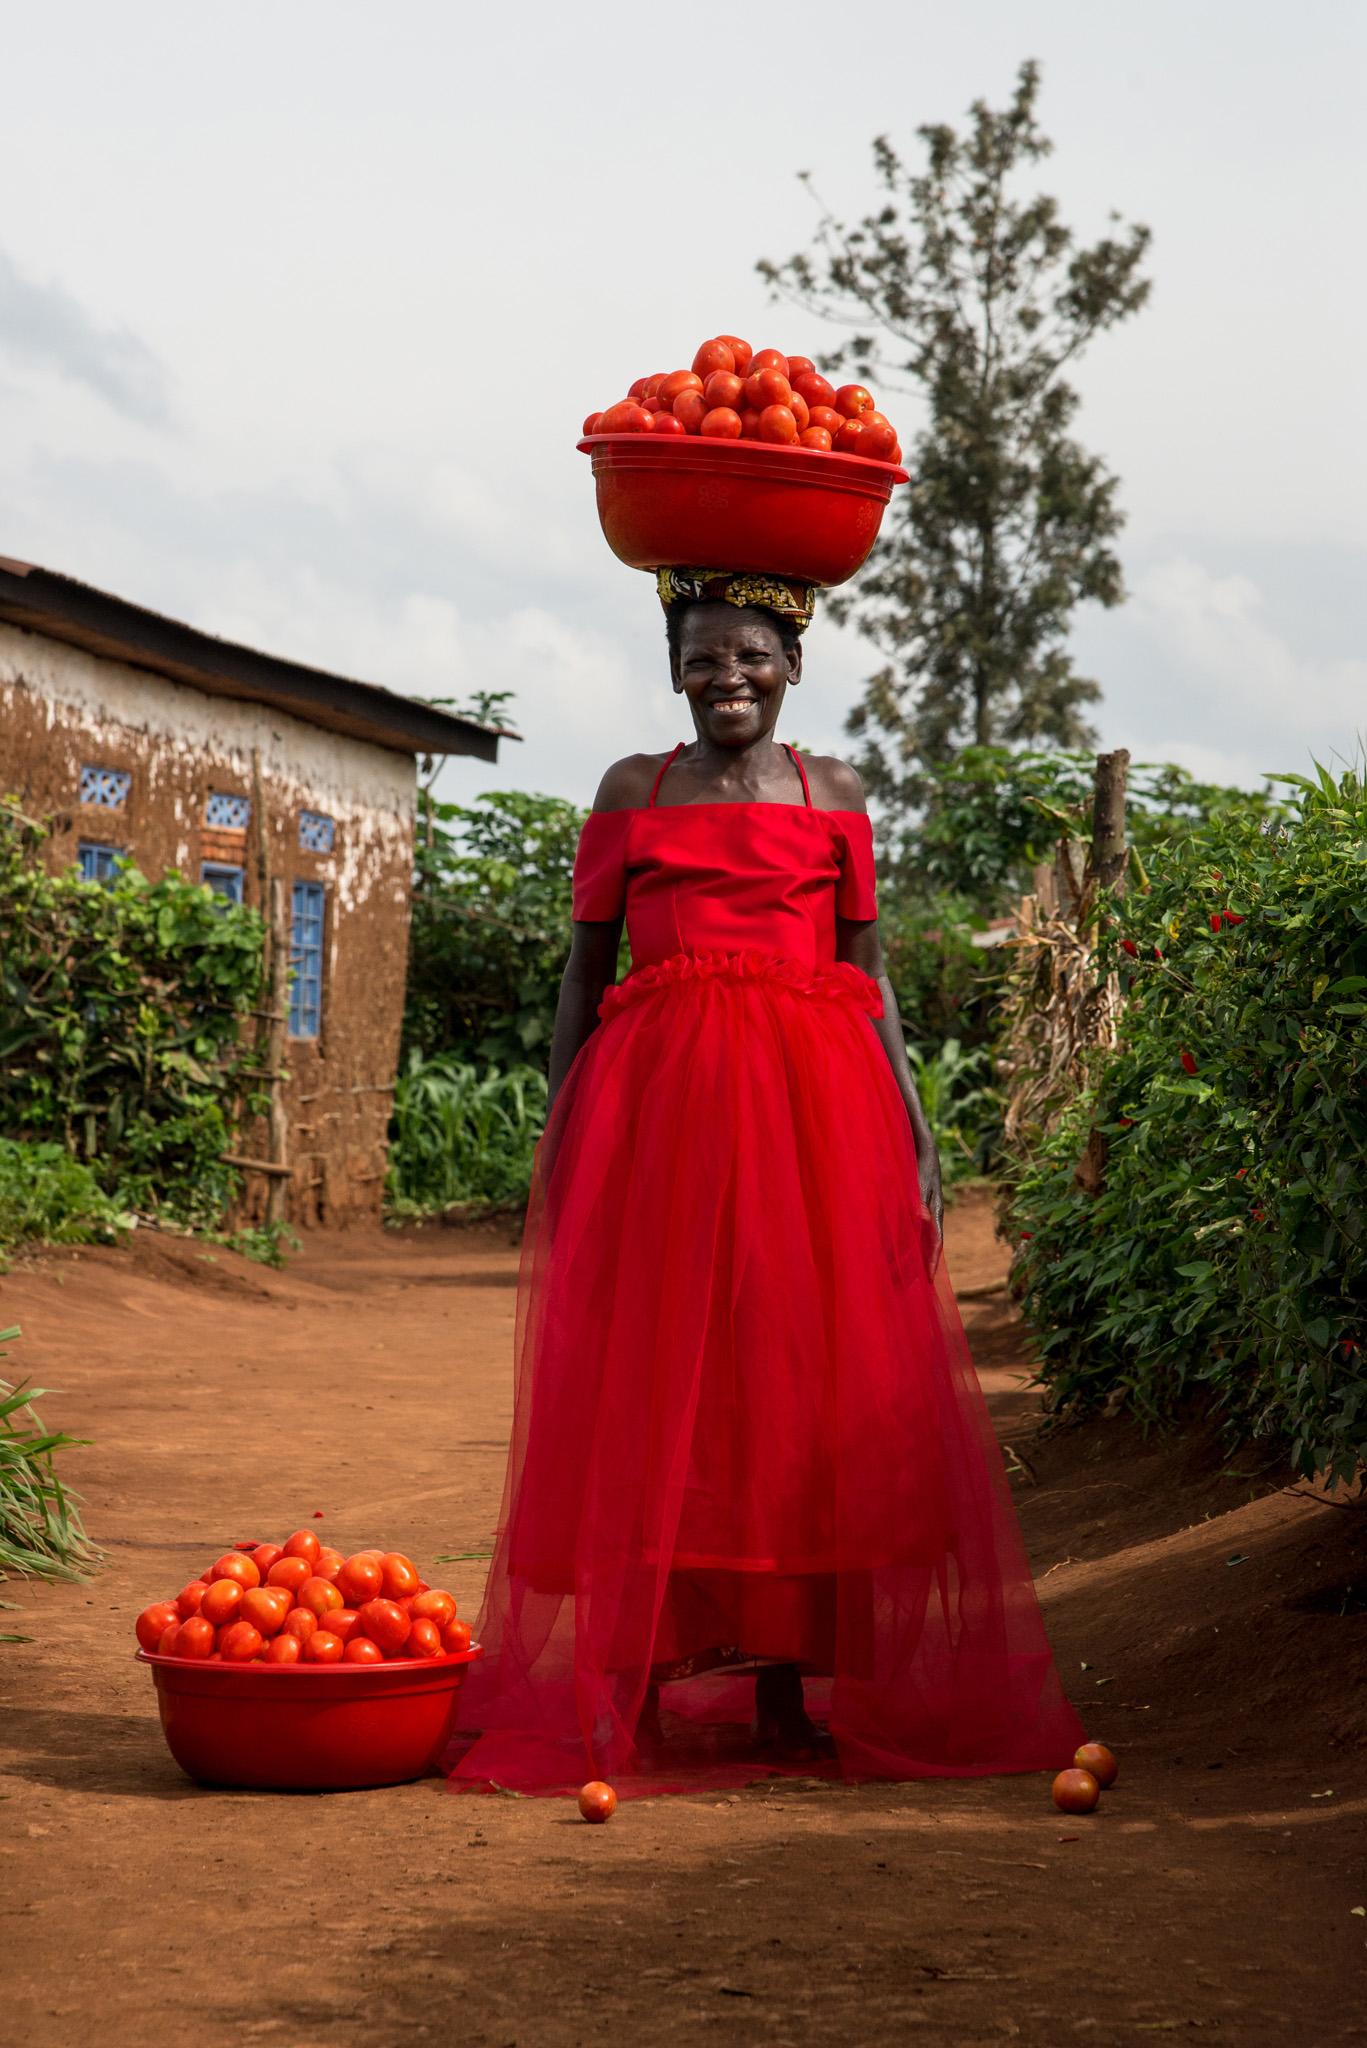 Rwanda Cedric Mizero photo © Chris Schwagga